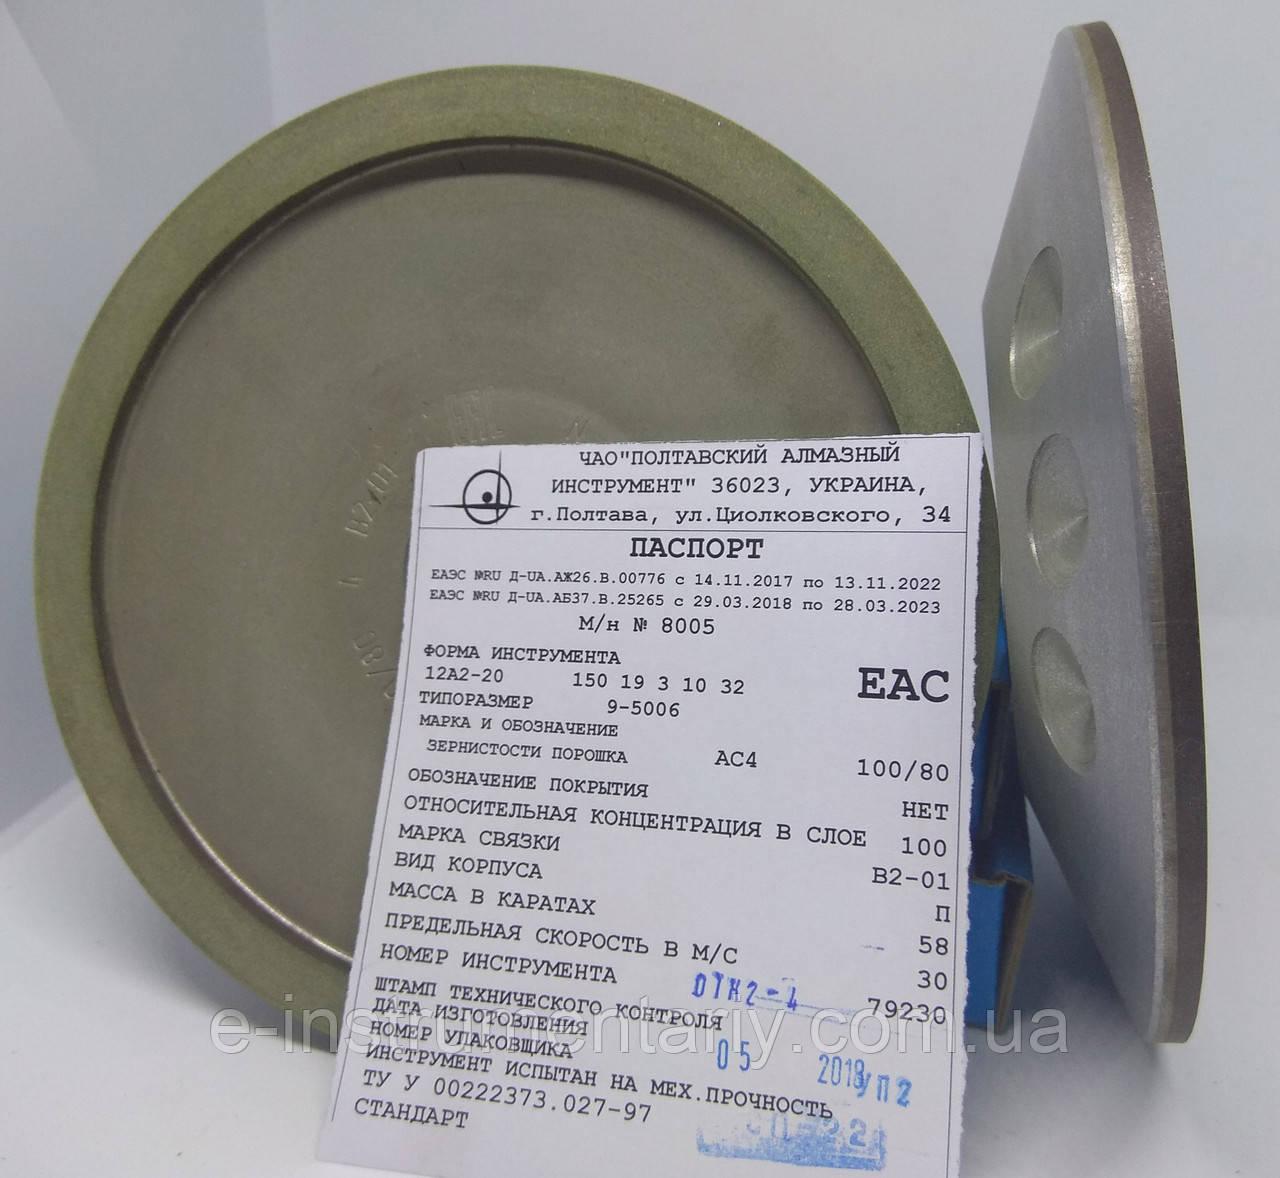 Круг алмазный Тарелка(12А2-20) 150х10х3х19х32 100% АС4 Связка В2-01